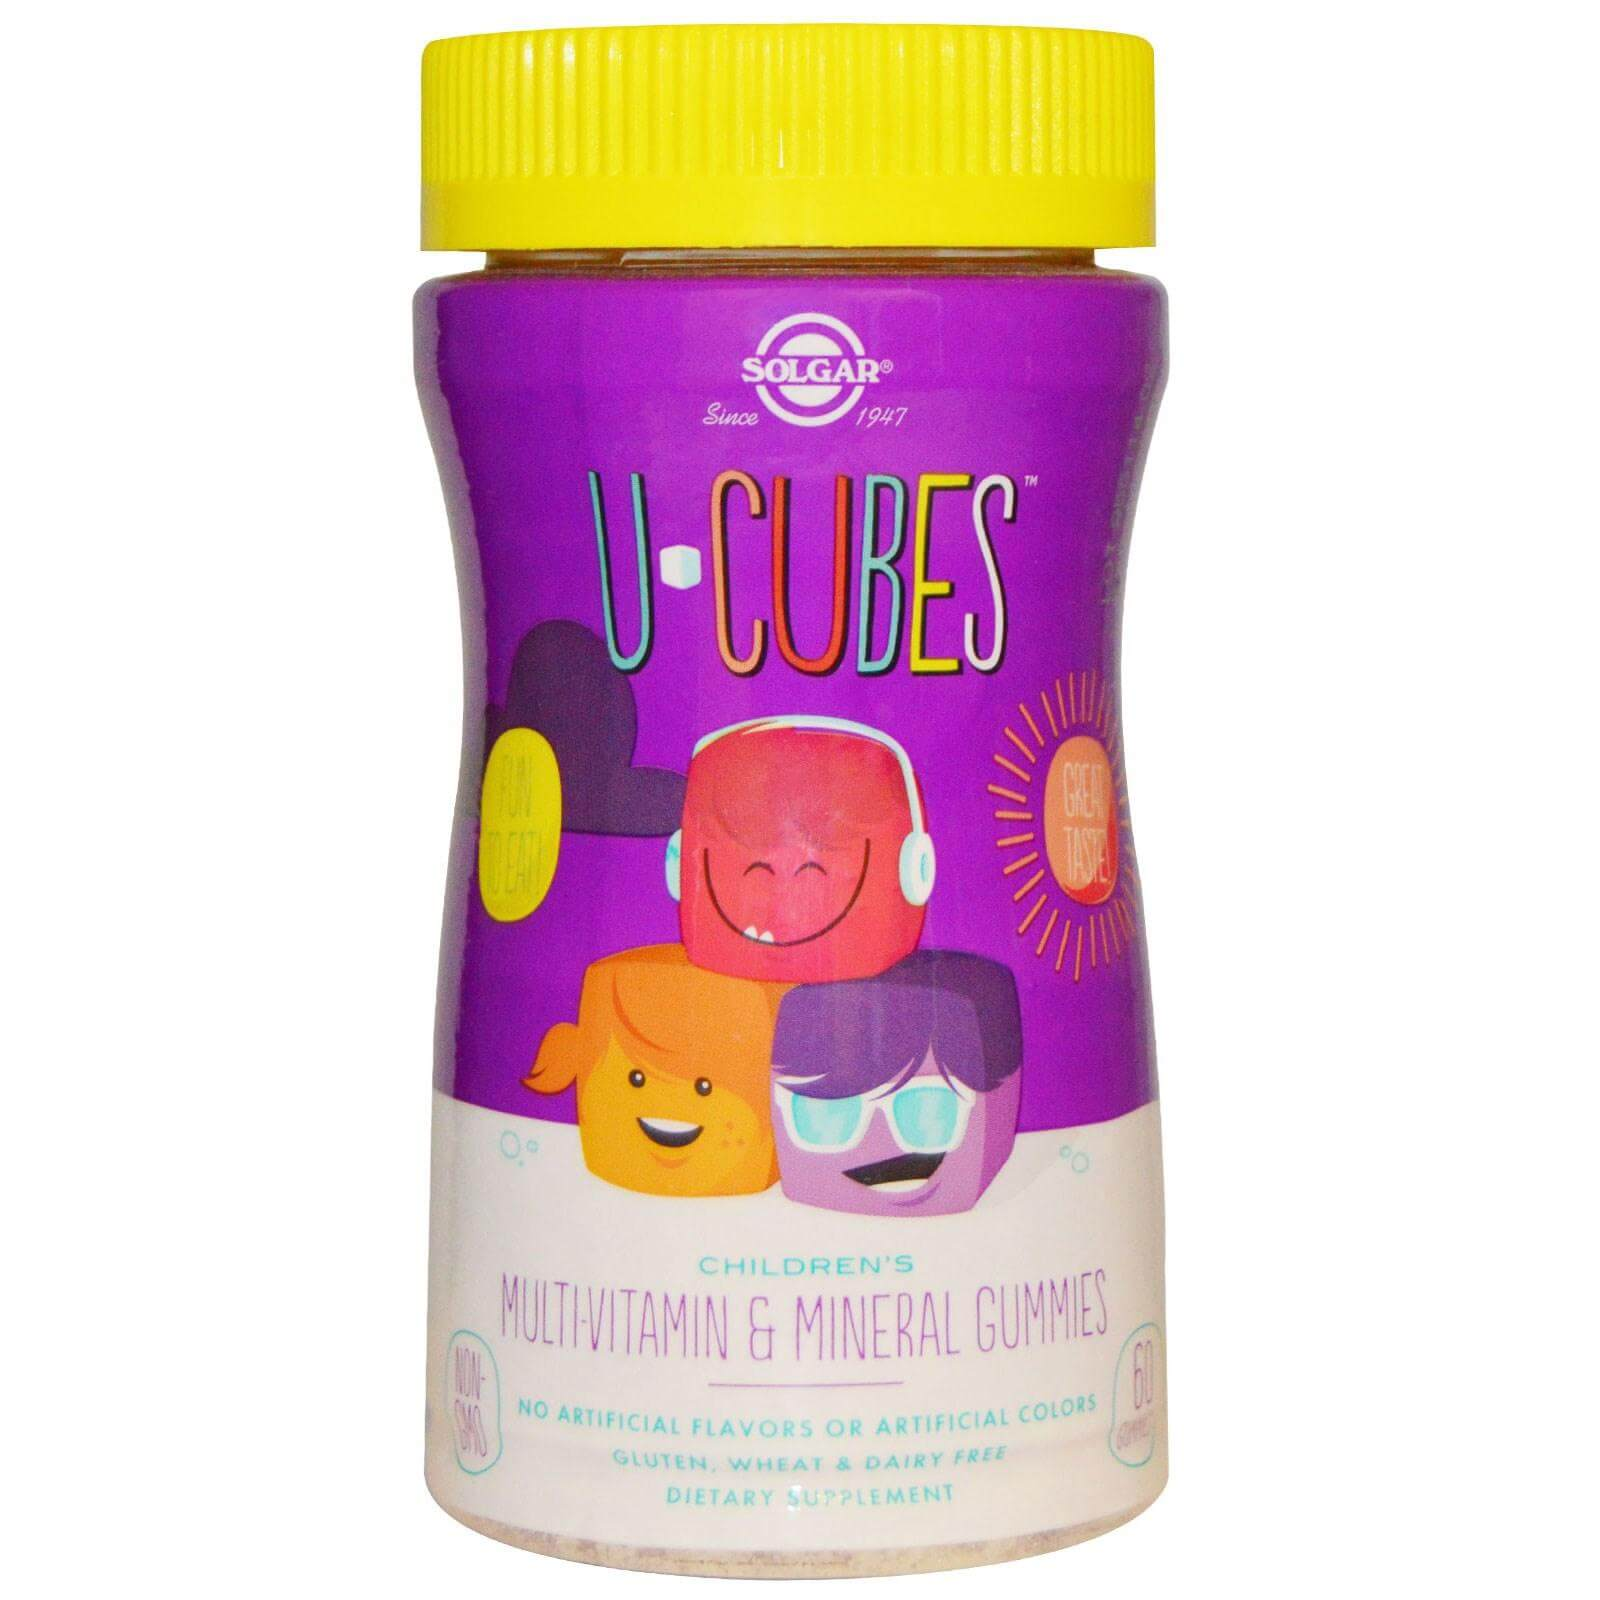 Solgar U Cubes Childrens MultiVitamin & Mineral Gummies Πολυβιταμινούχα Ζελεδάκια για Παιδιά για Ενέργεια & Τόνωση 60 gummies